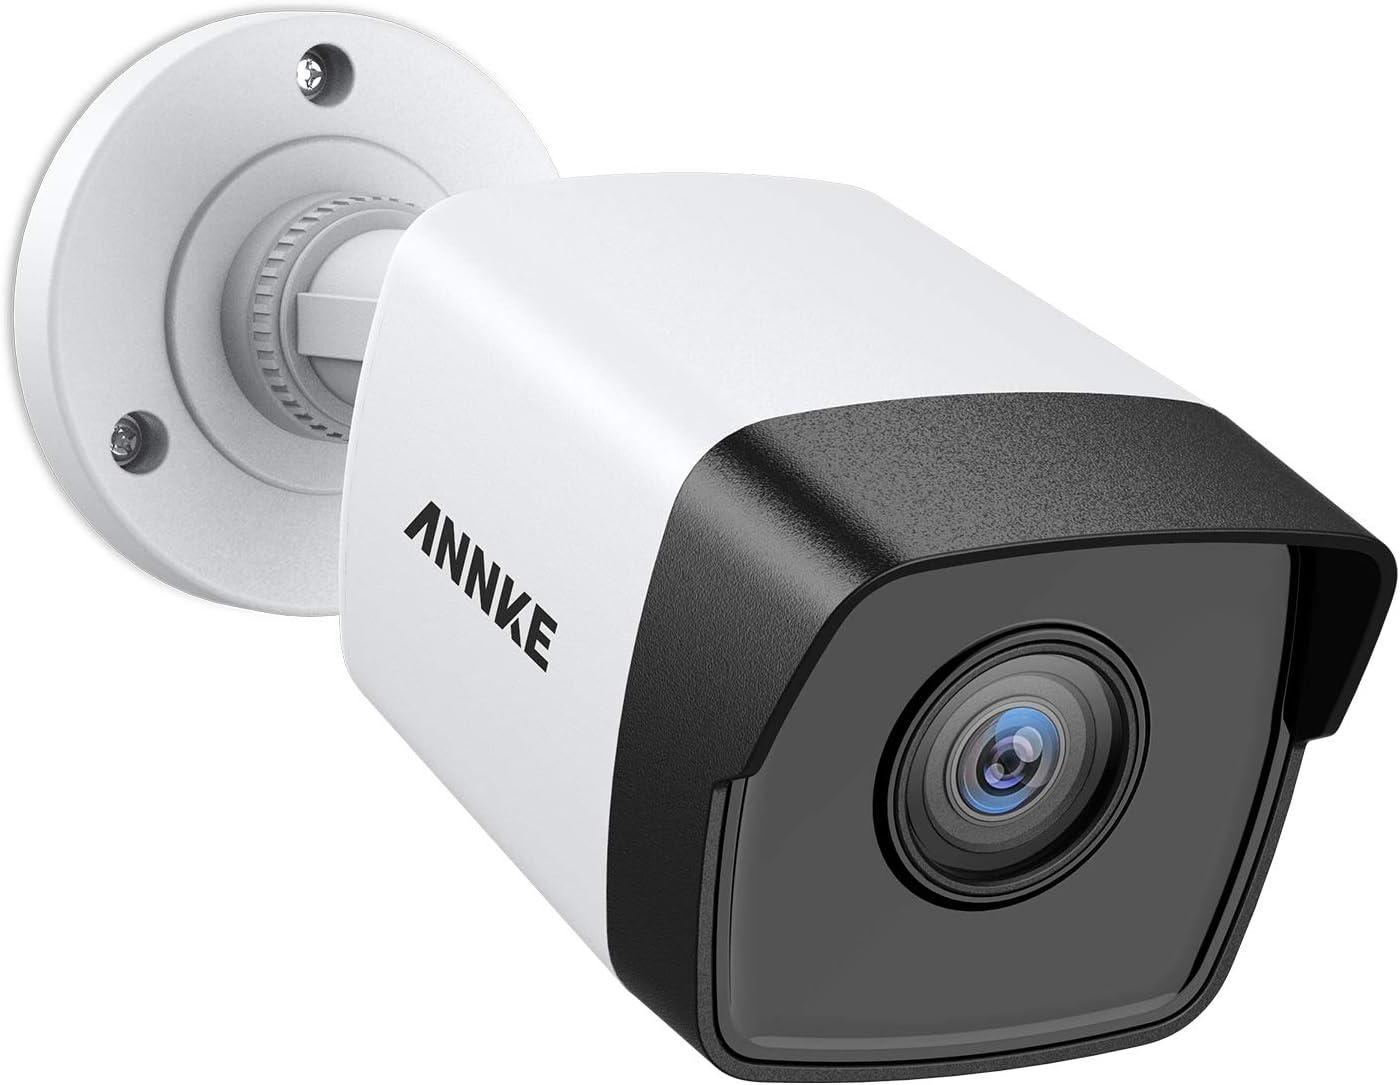 ANNKE C500 5MP PoE Security IP Bullet Camera w/ Audio,100ft EXIR 2.0 Color Night Vision, Built-in Mic, H.265+ Internet IP Camera, Digital WDR, IP67 Weatherproof, Smart Motion Alerts